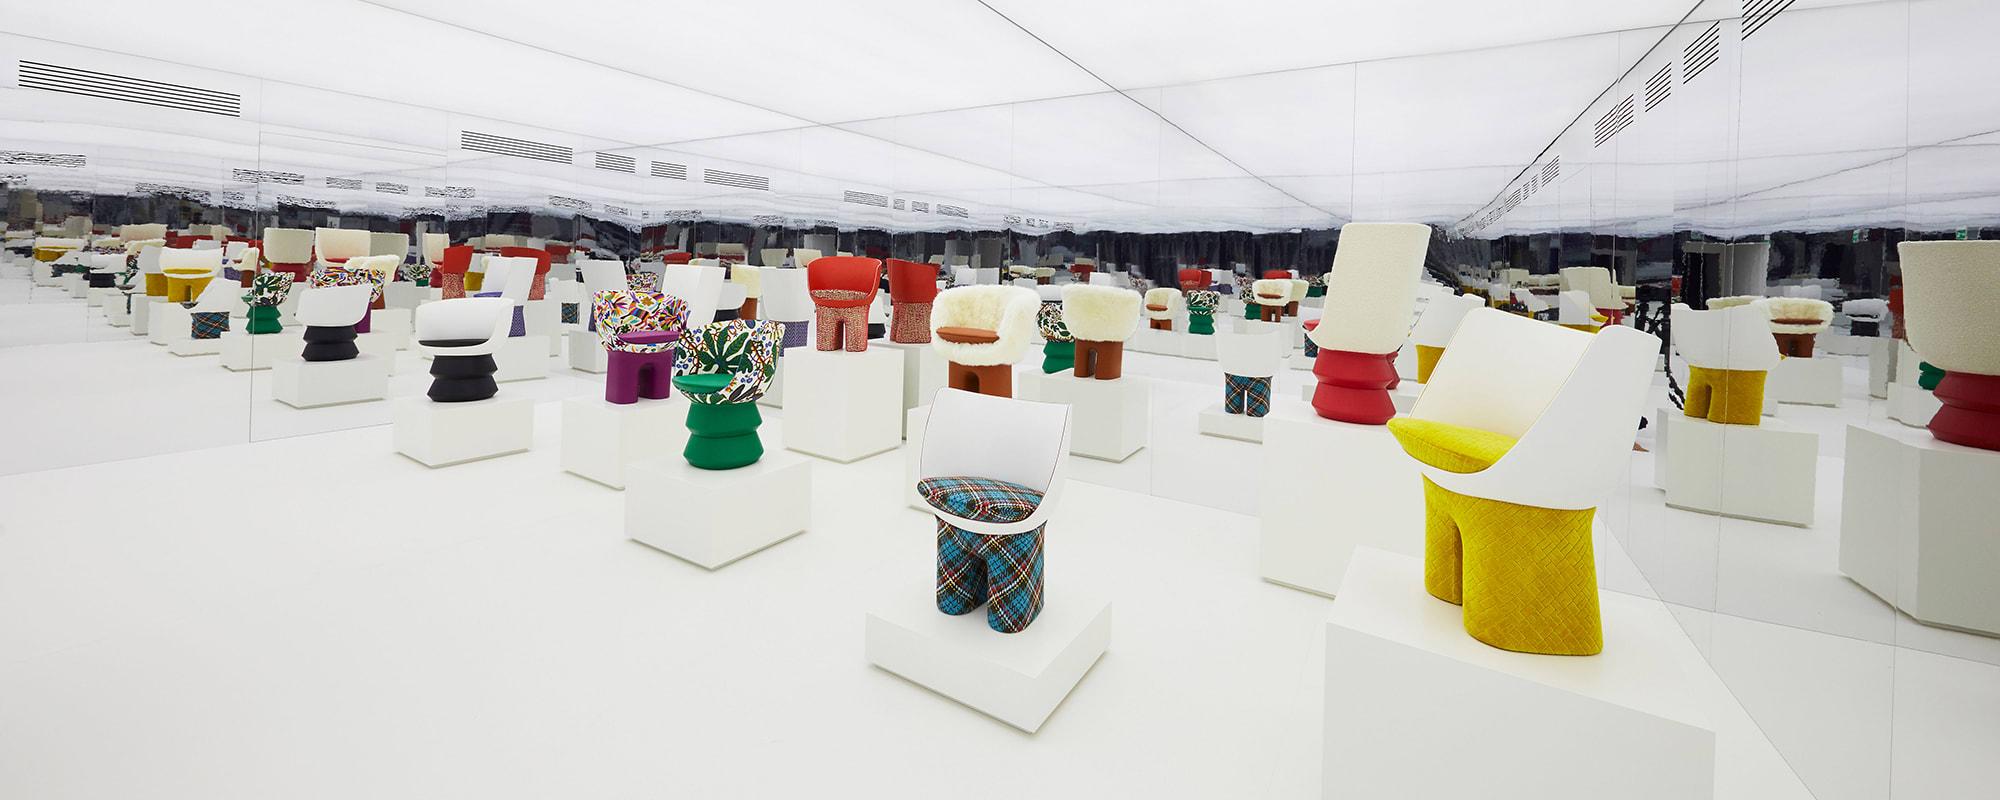 Salone, Louis Vuitton, Objets Nomades